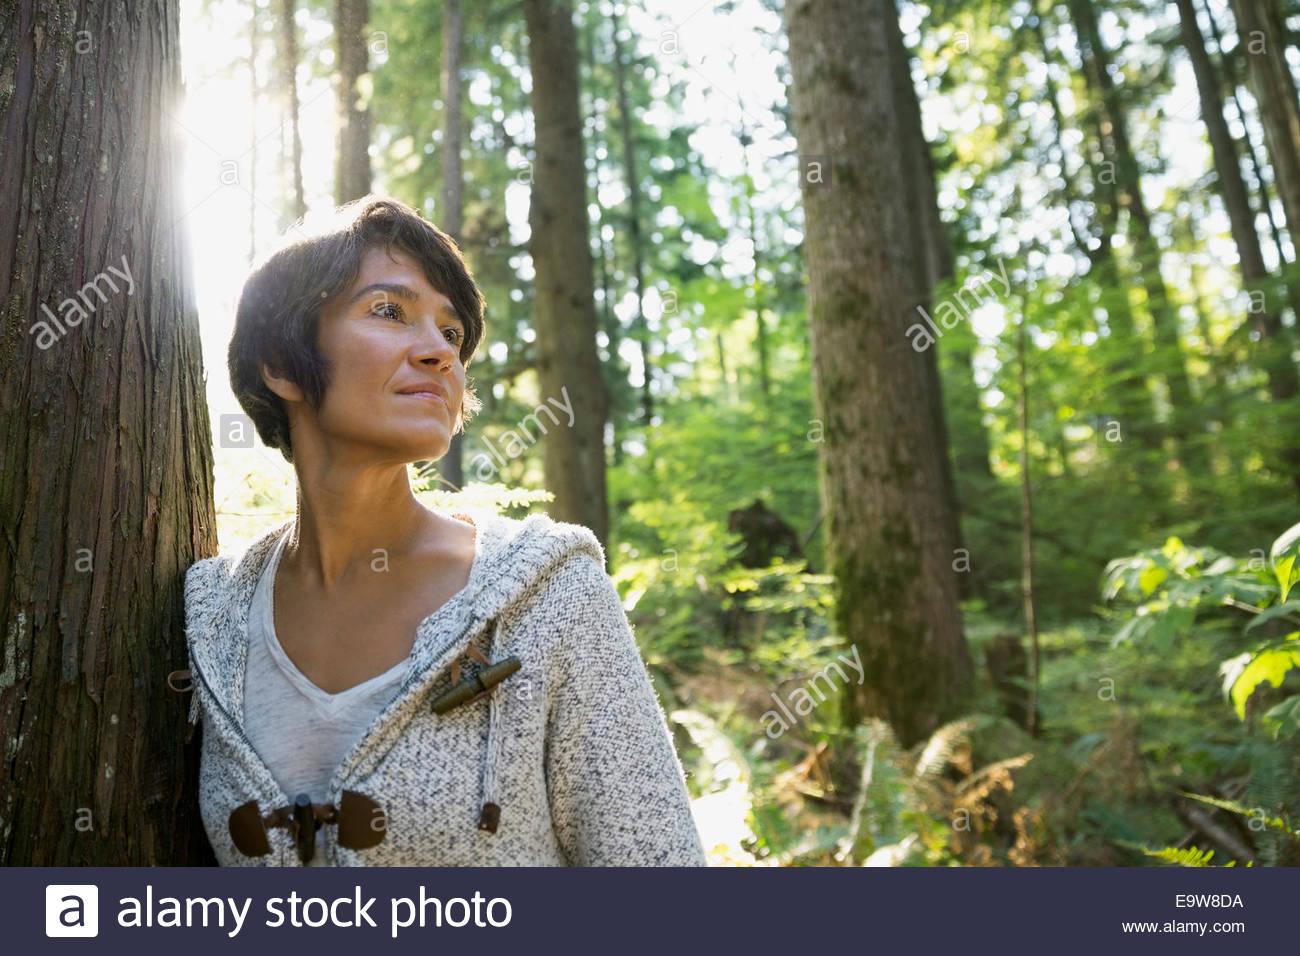 Gelassene Frau lehnte sich gegen Baum im Wald Stockbild